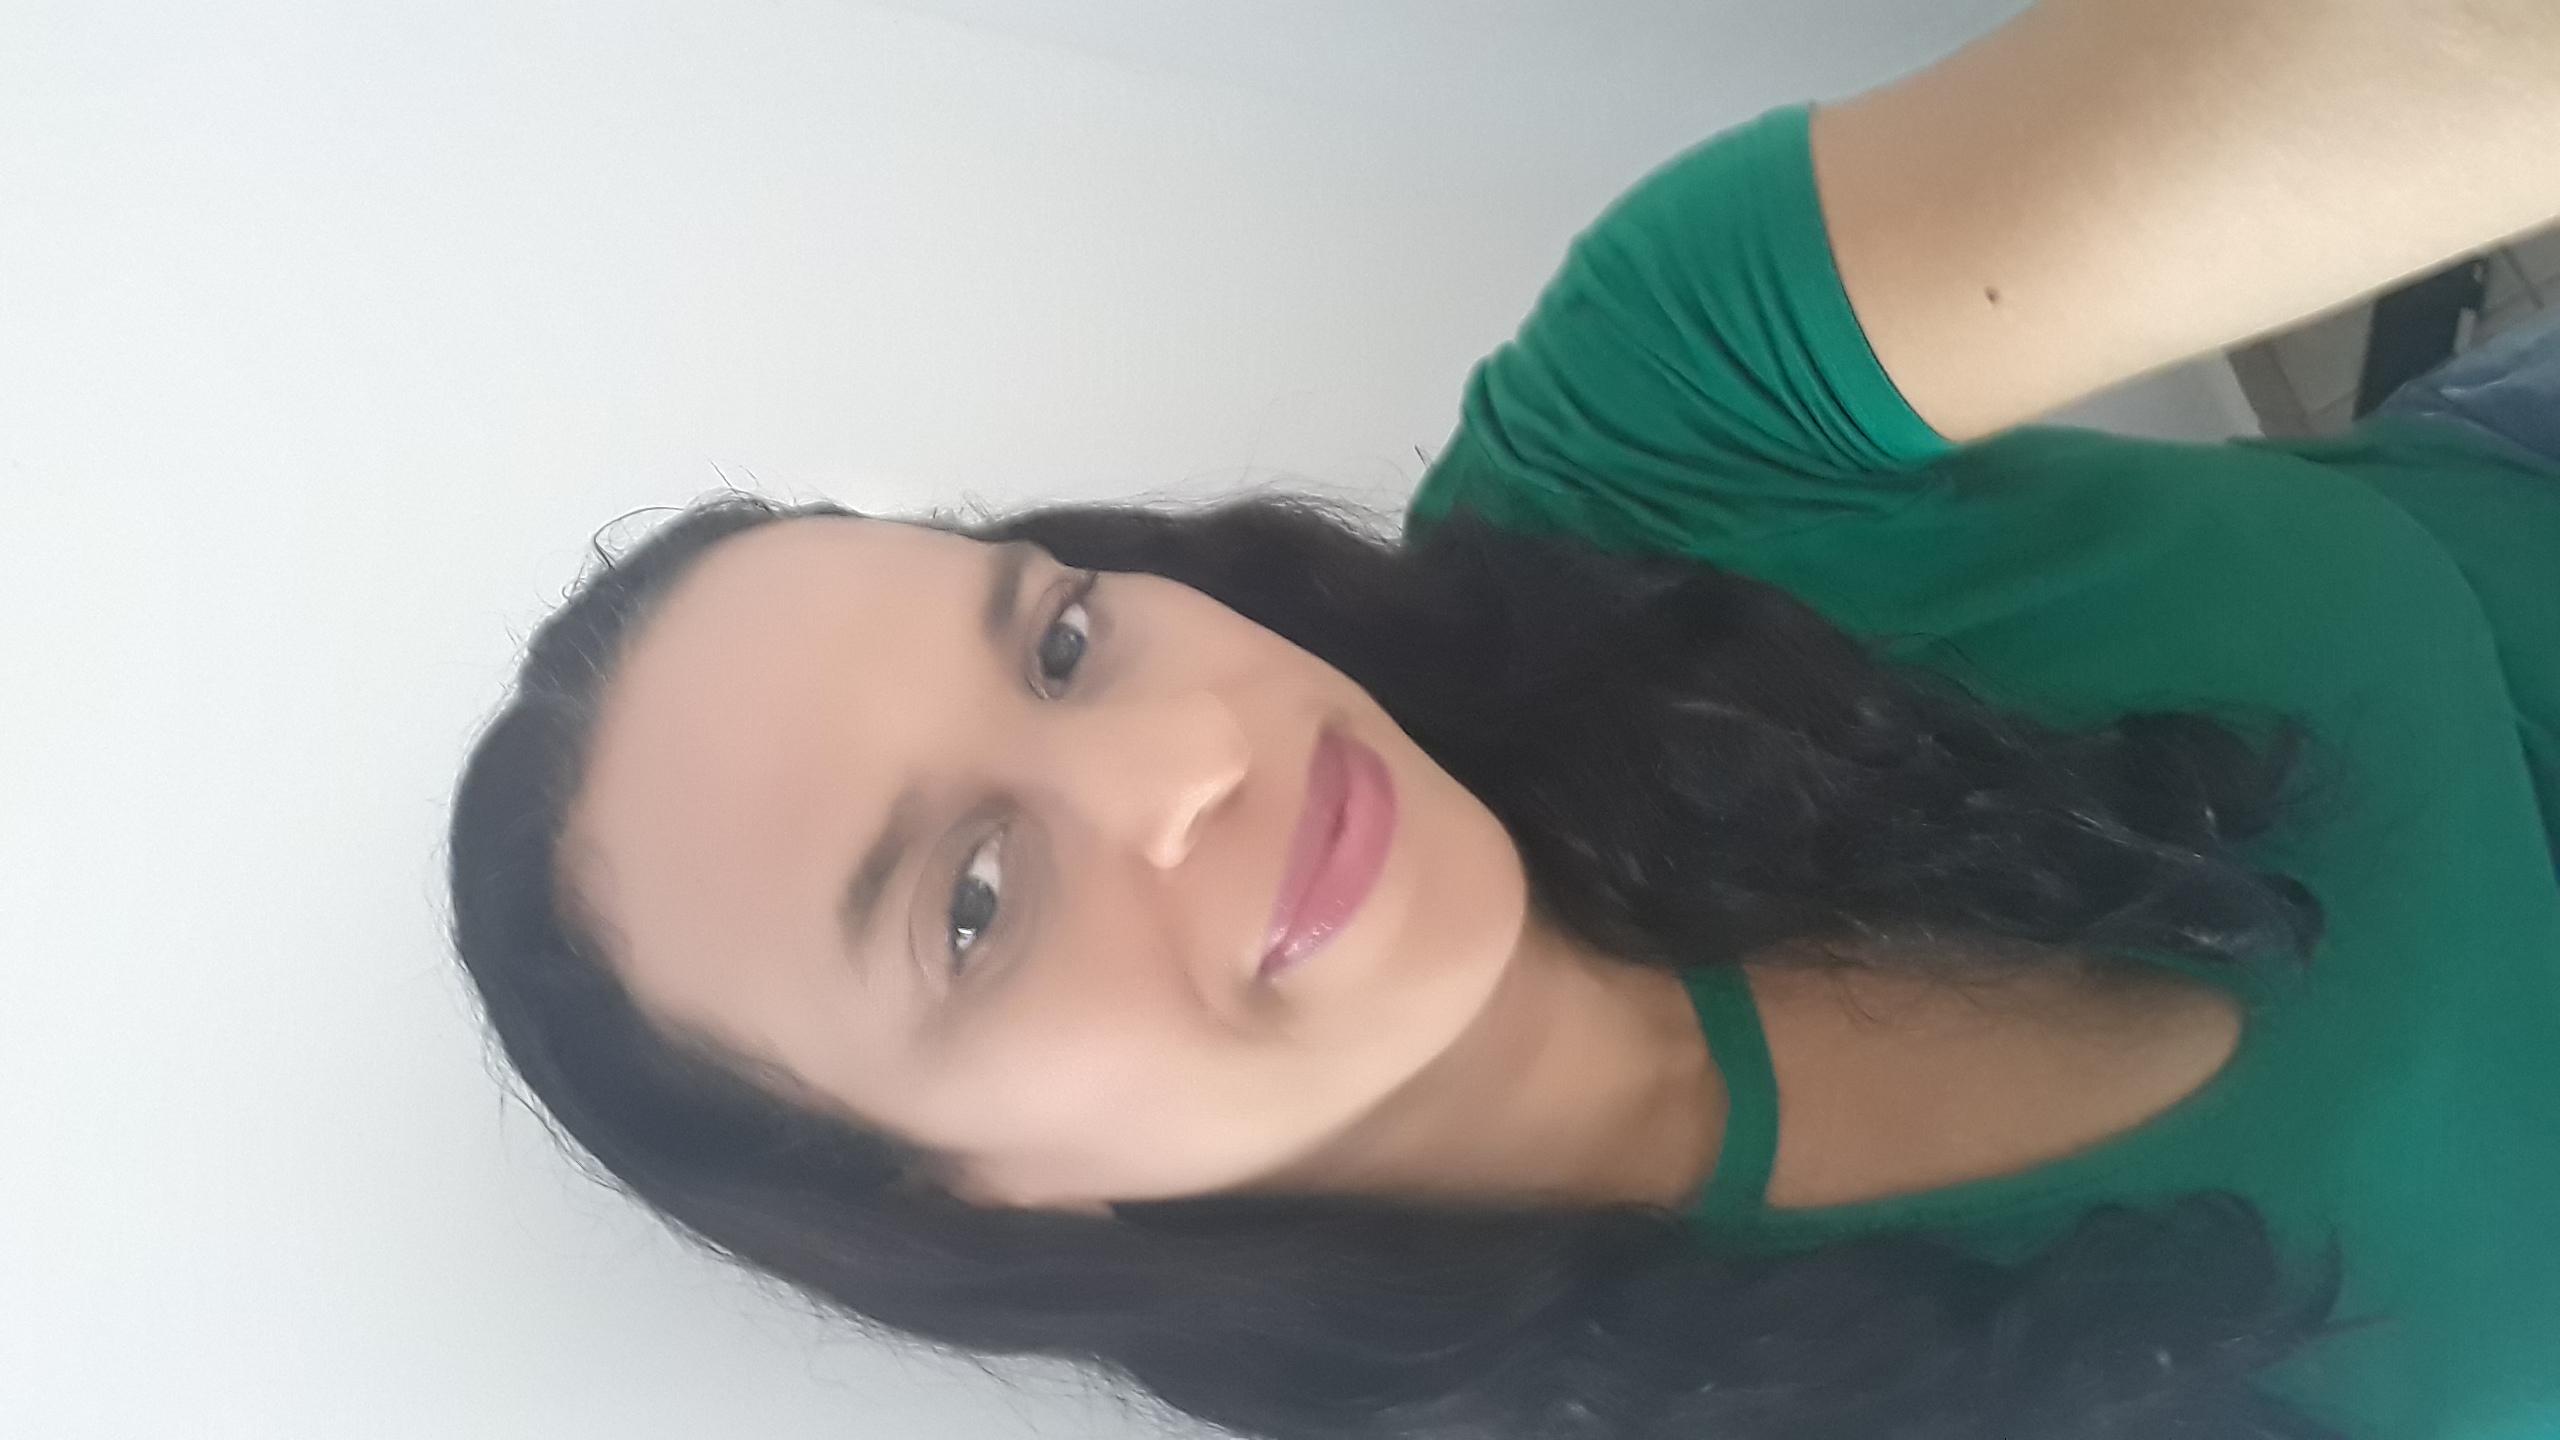 Rosemere Almeida